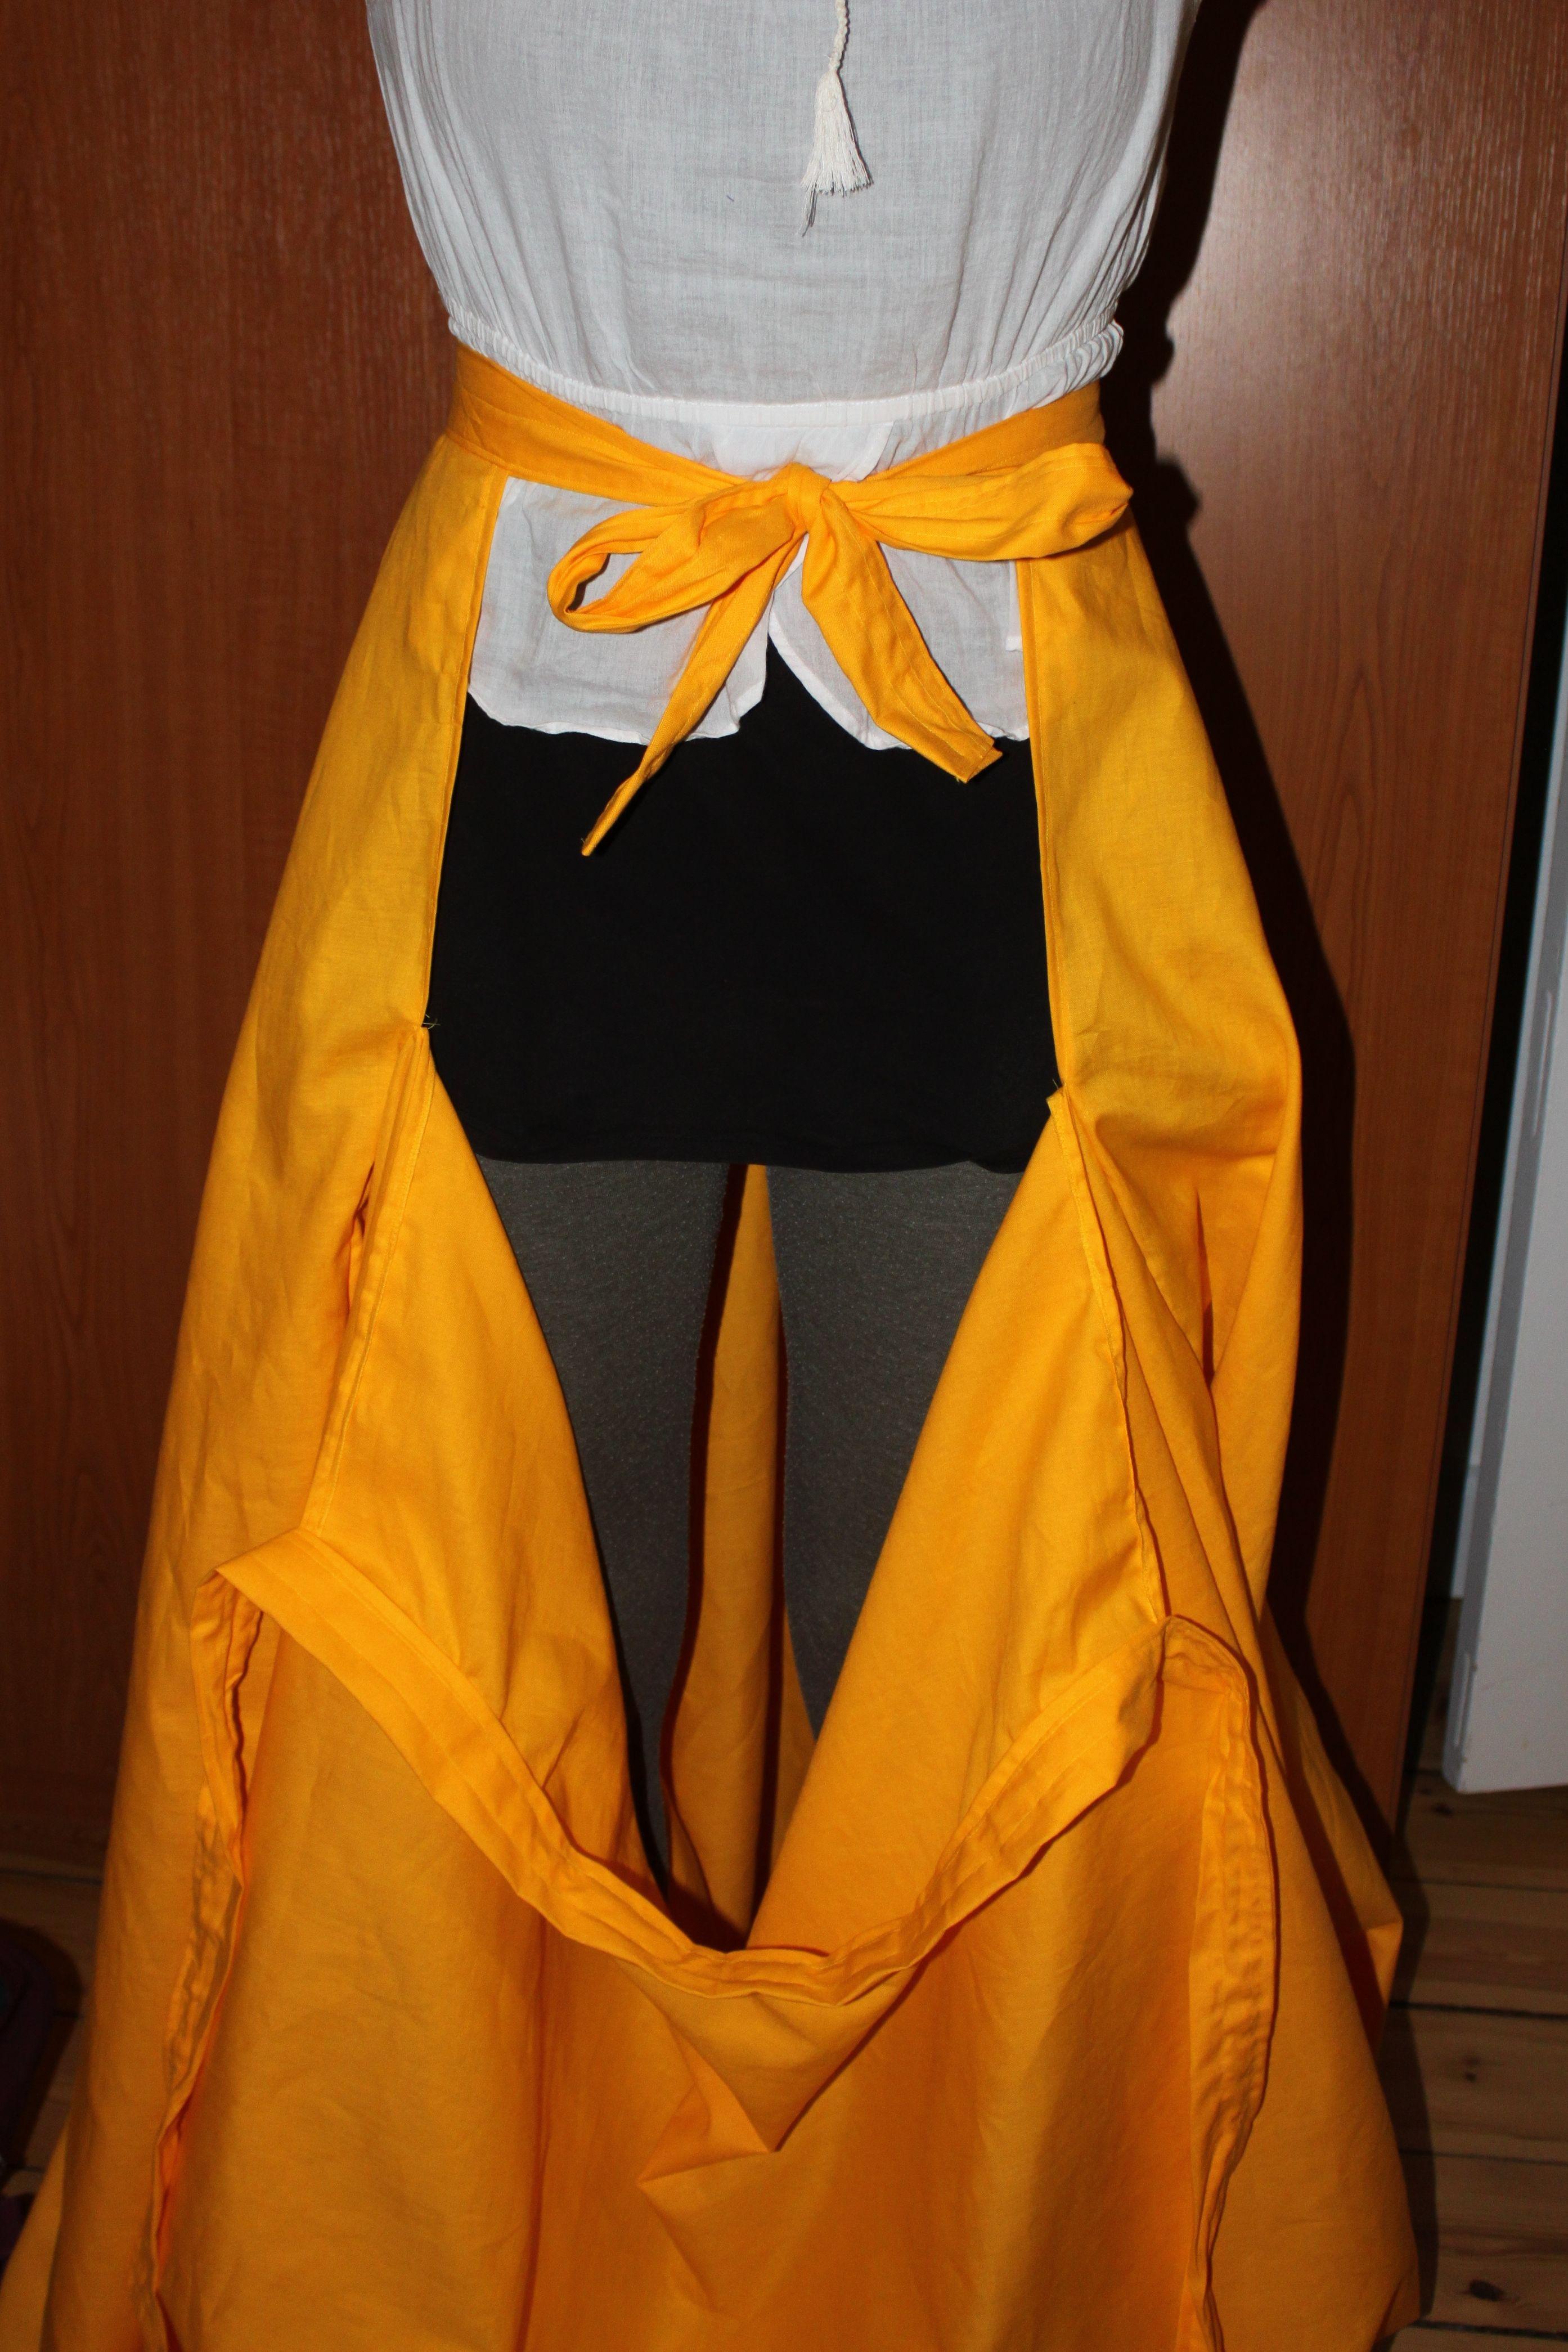 db28823d6 How to make a folklórico skirt (falda acampanada de circunferencia ...